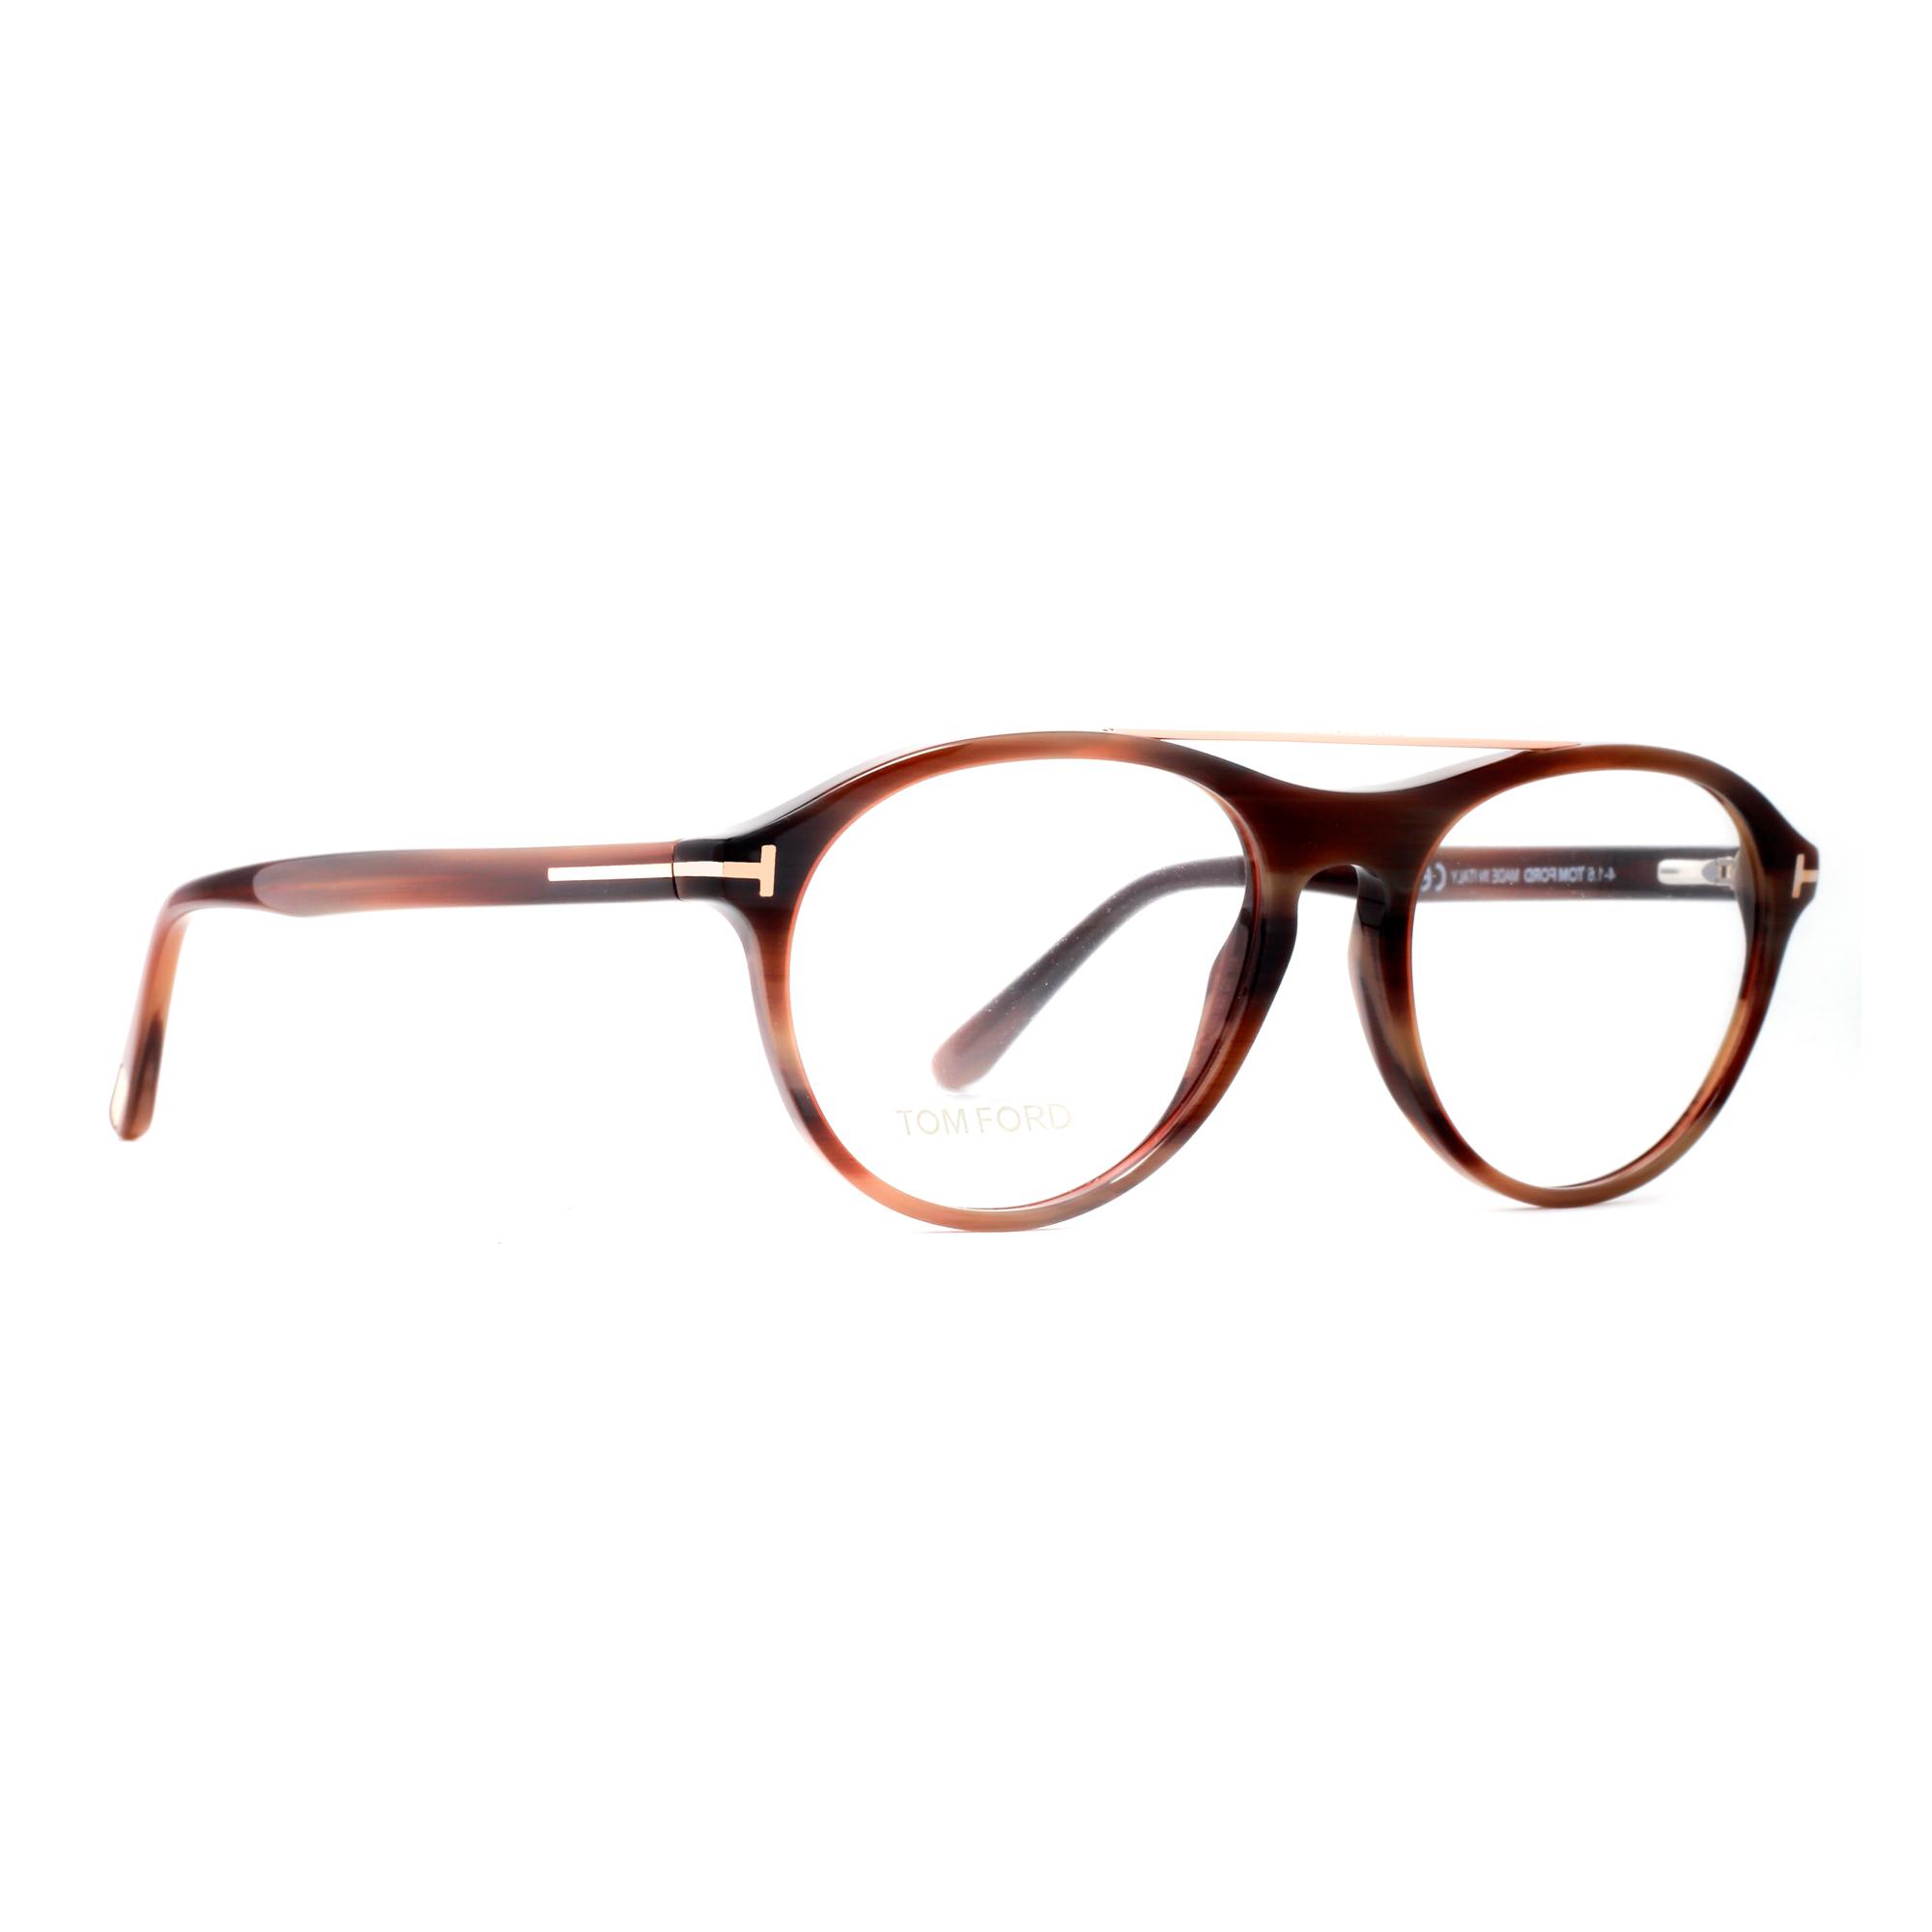 d86e8be795e Tom Ford Round Eyeglass Frames - Bitterroot Public Library